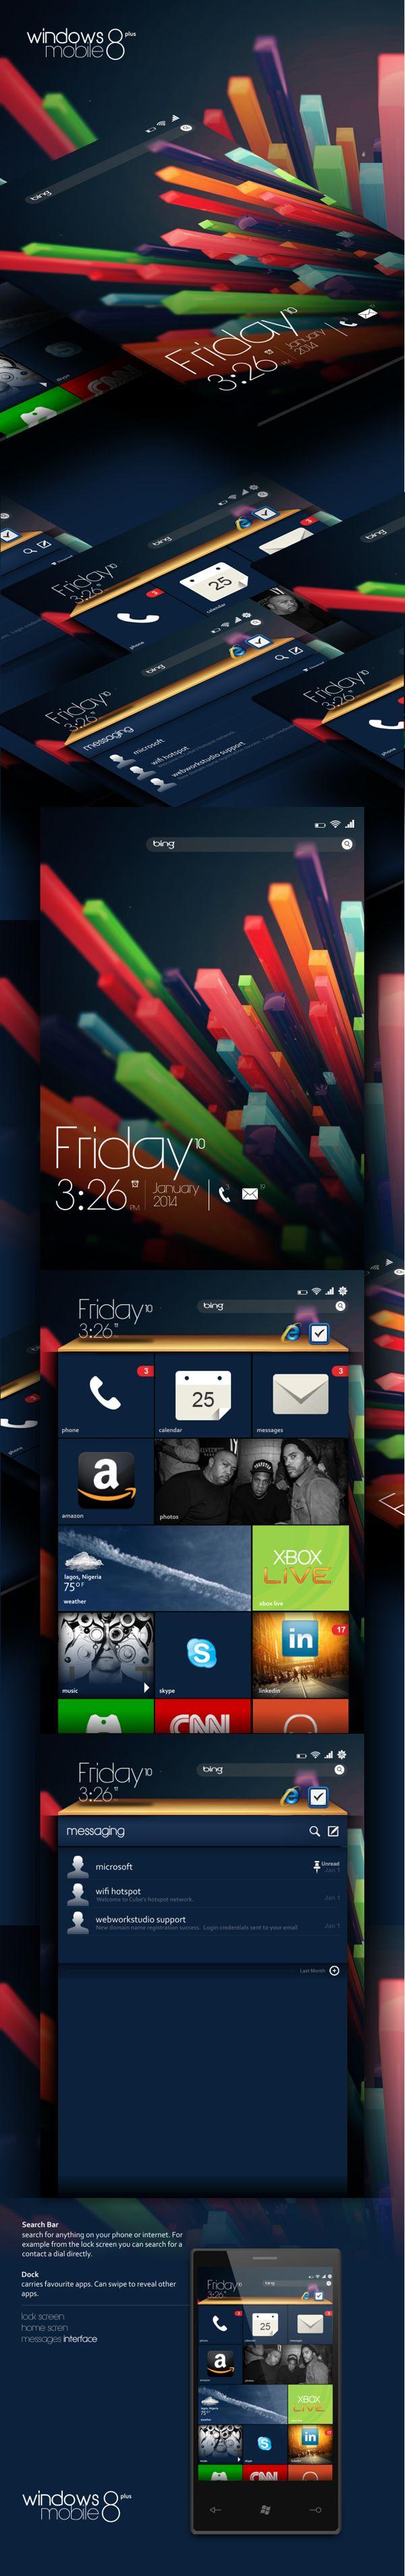 Windows Mobile 8 plus (mockup) by Kofo Adesanya, via Behance